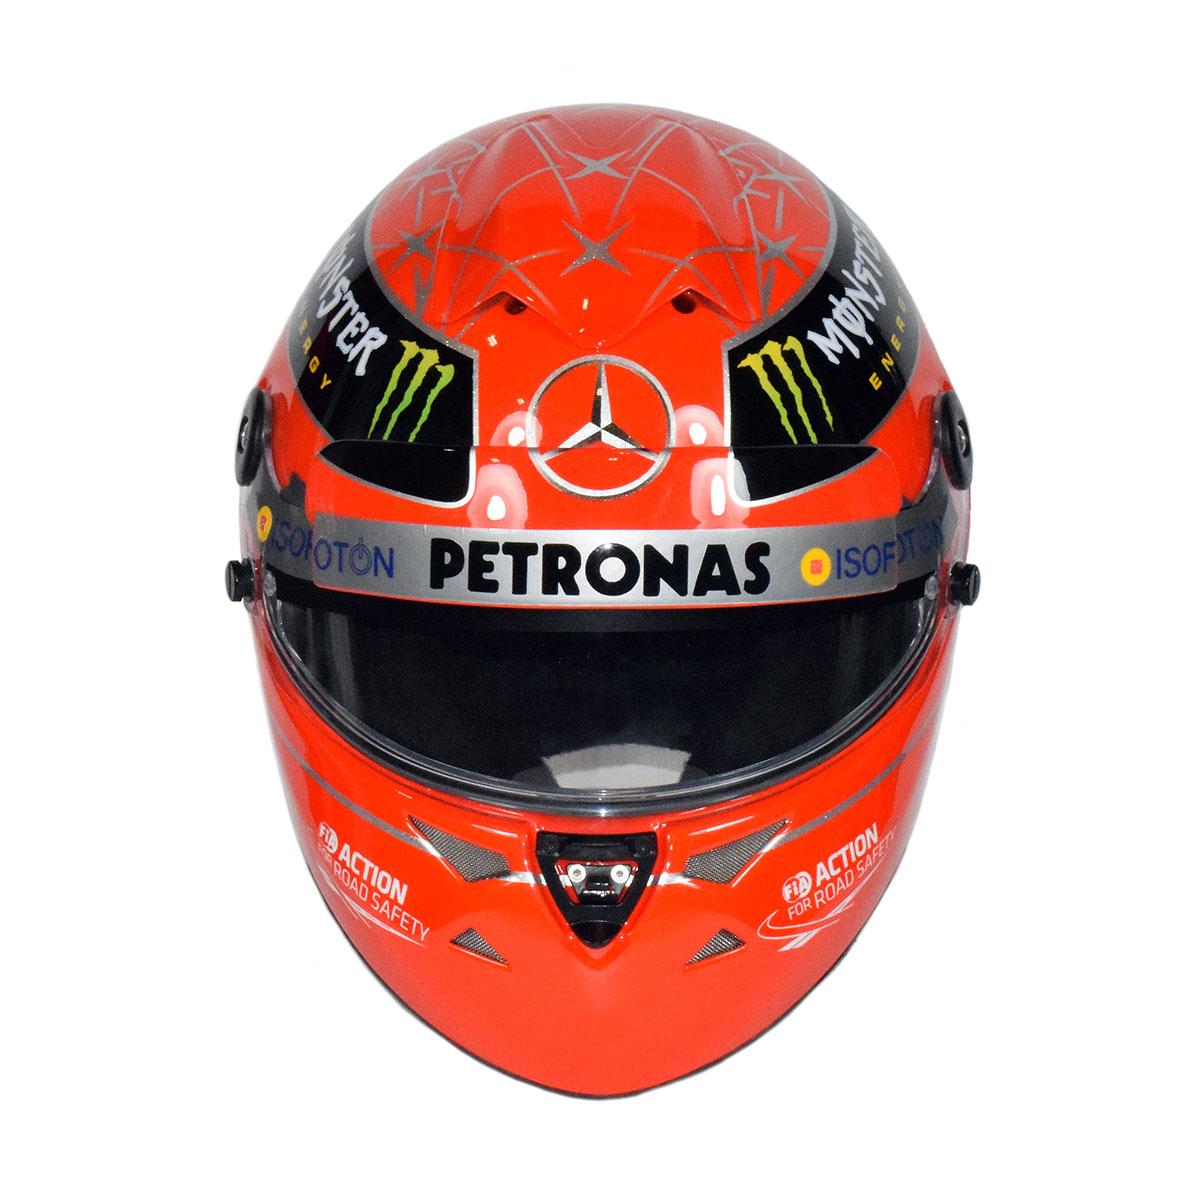 2012 Michael Schumacher Brazil Gp Schuberth Sf1 Carbon Replica F1 Helmet Racing Hall Of Fame Collection